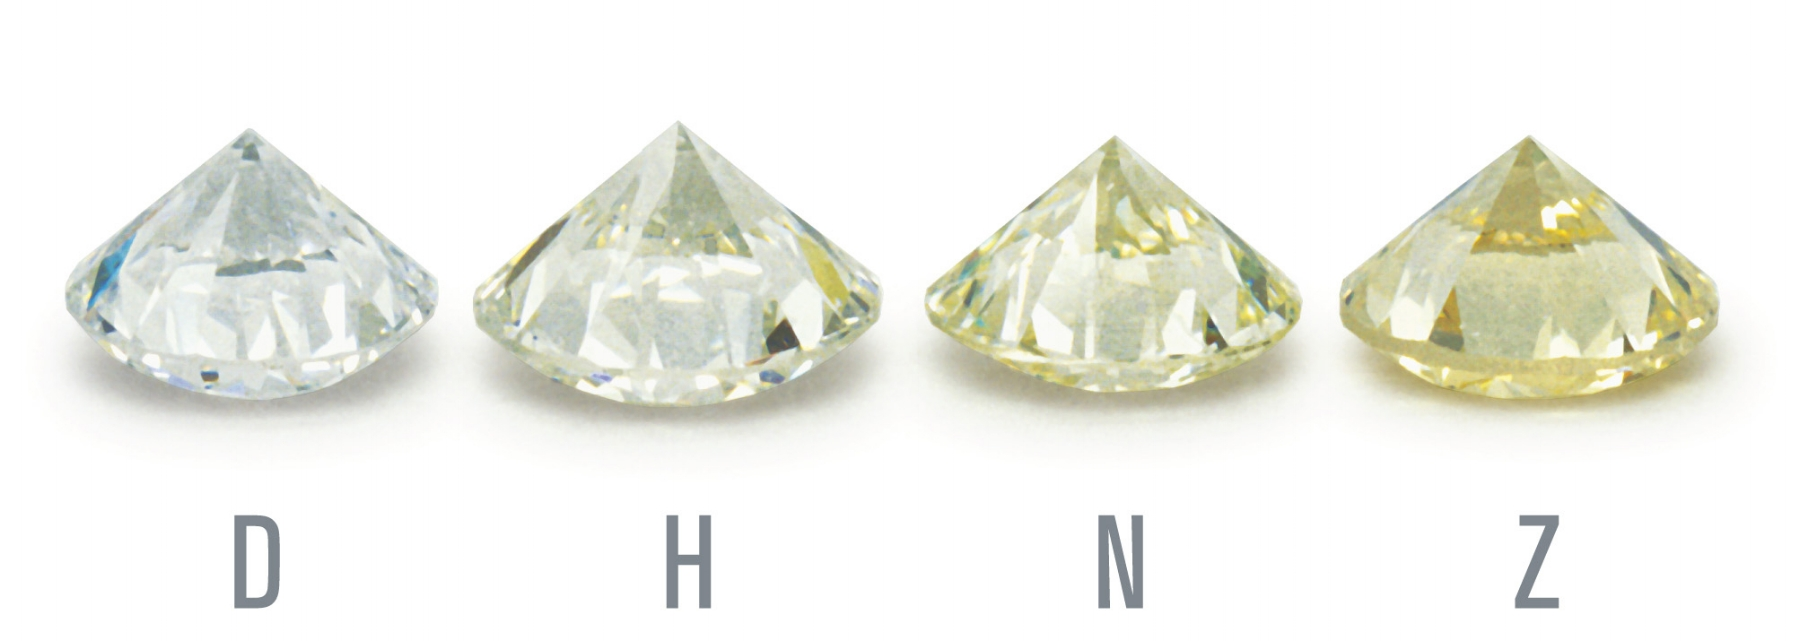 diamond color.jpg